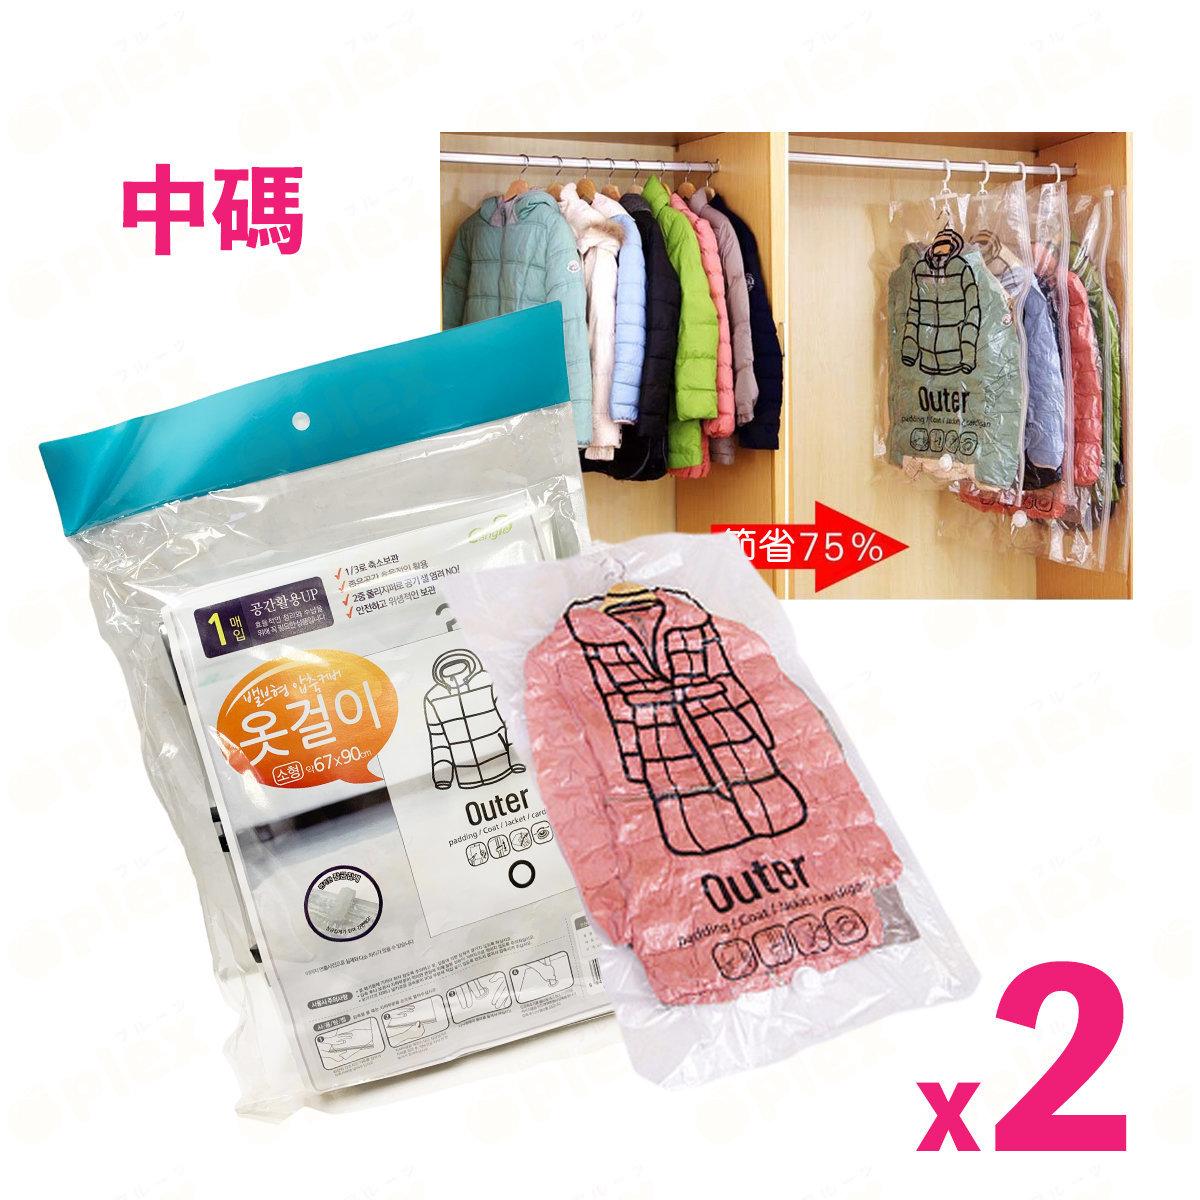 Hanging Vacuum Storage Bag - M Size x 2pcs (90cm x 67cm)